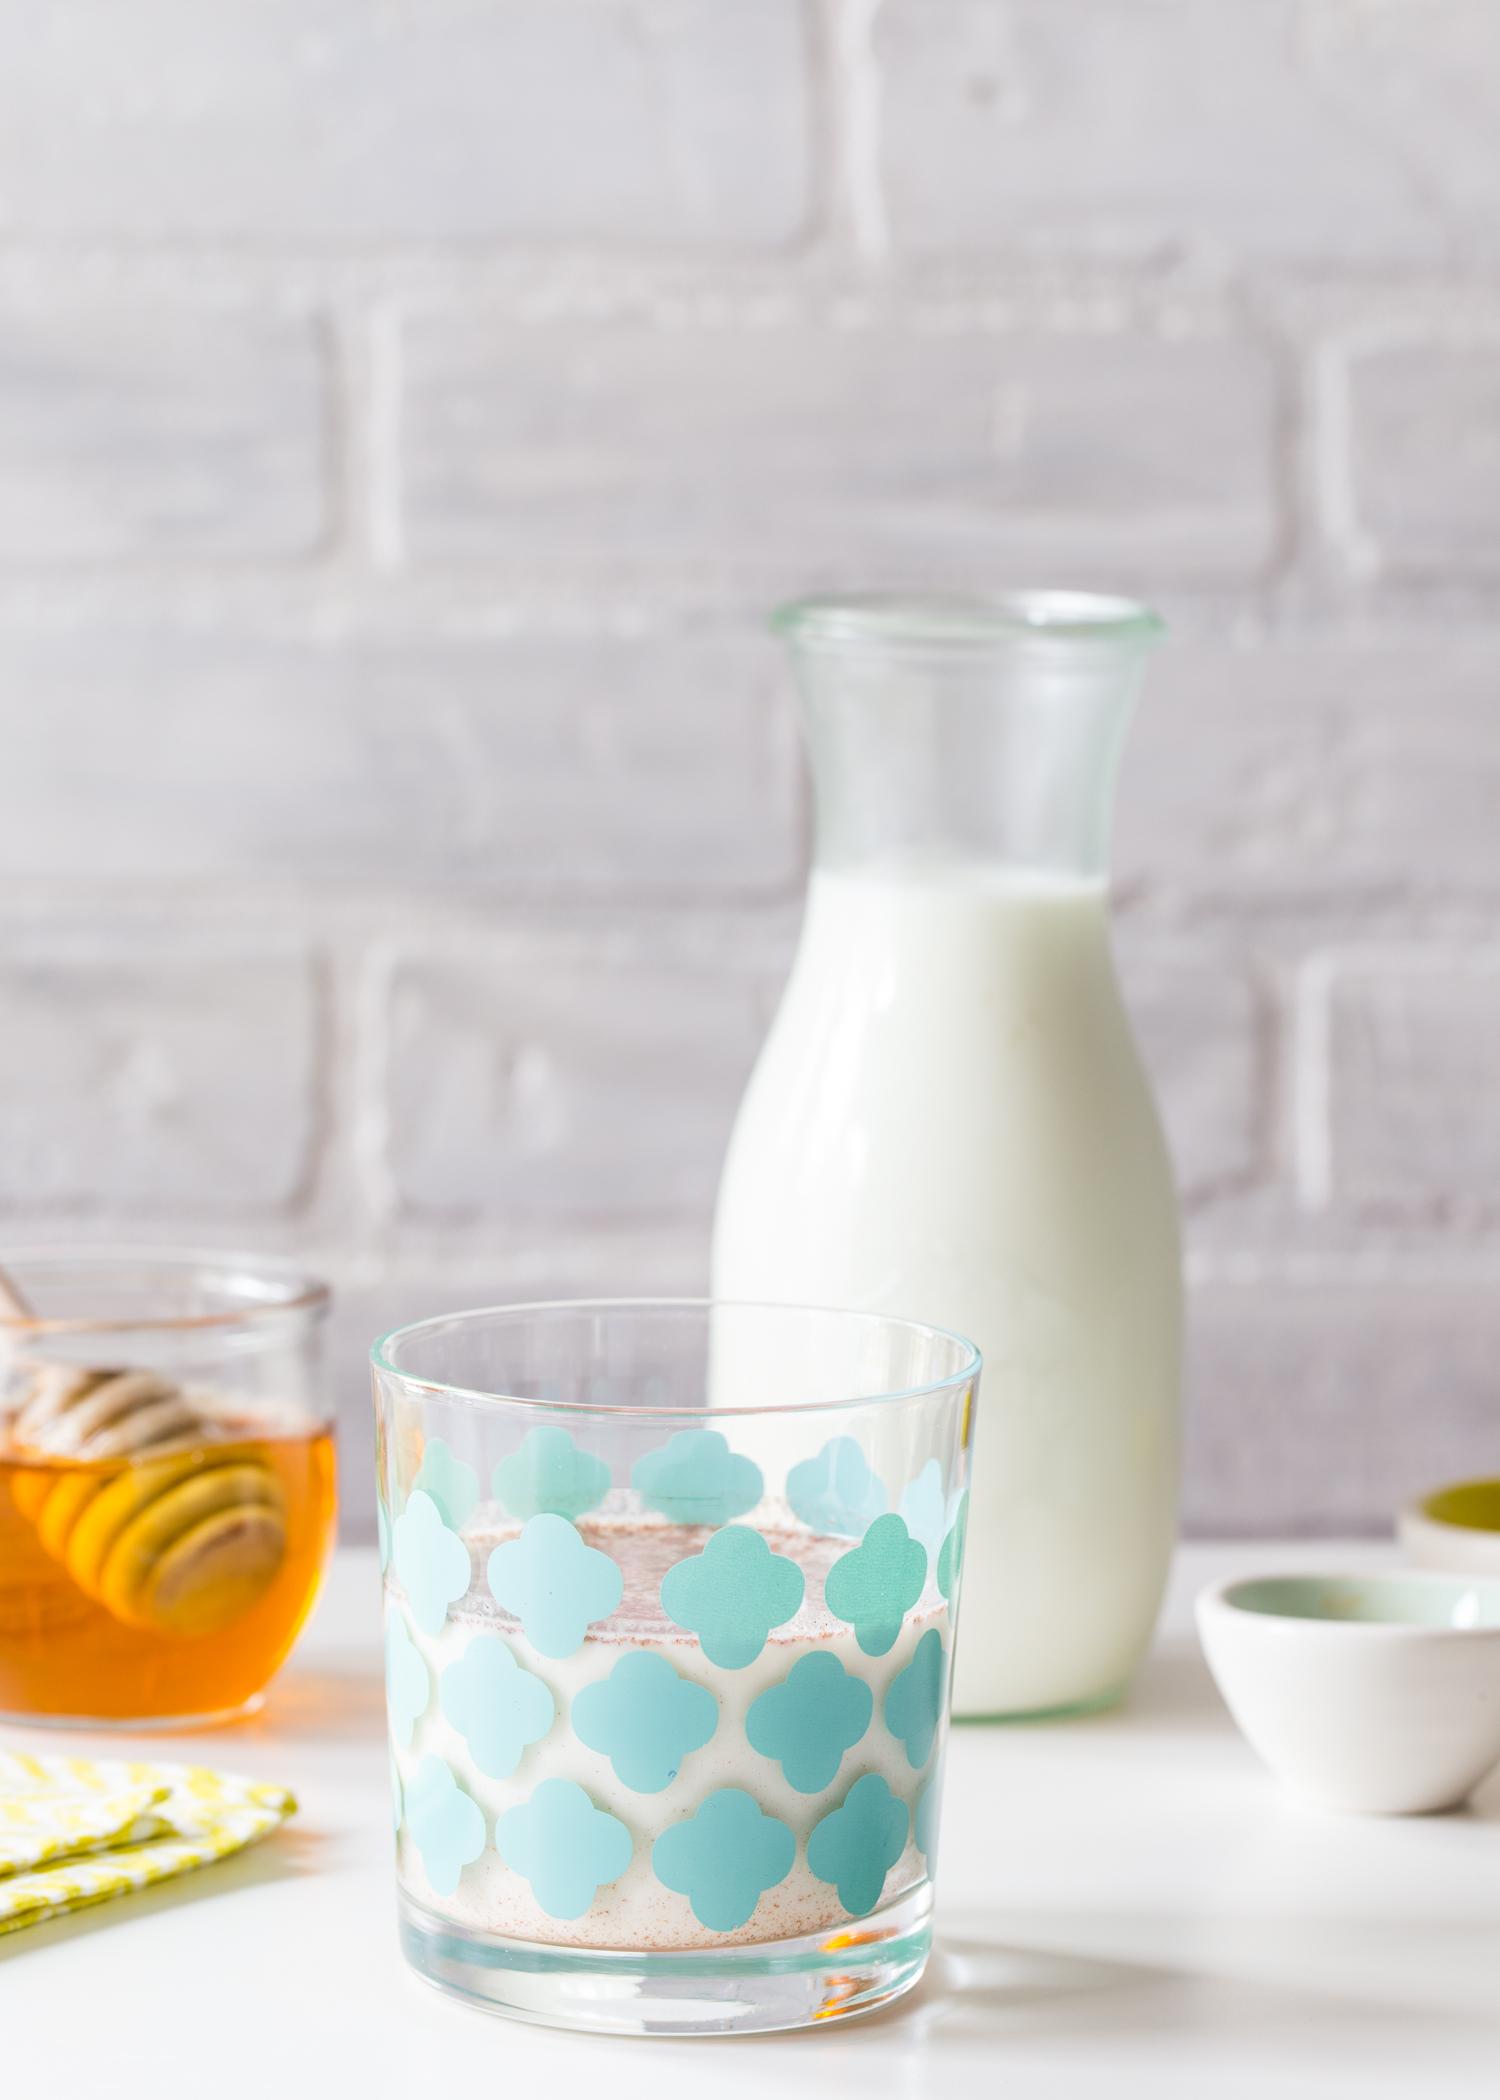 Flavored Milk - Vanilla Cinnamon Milk